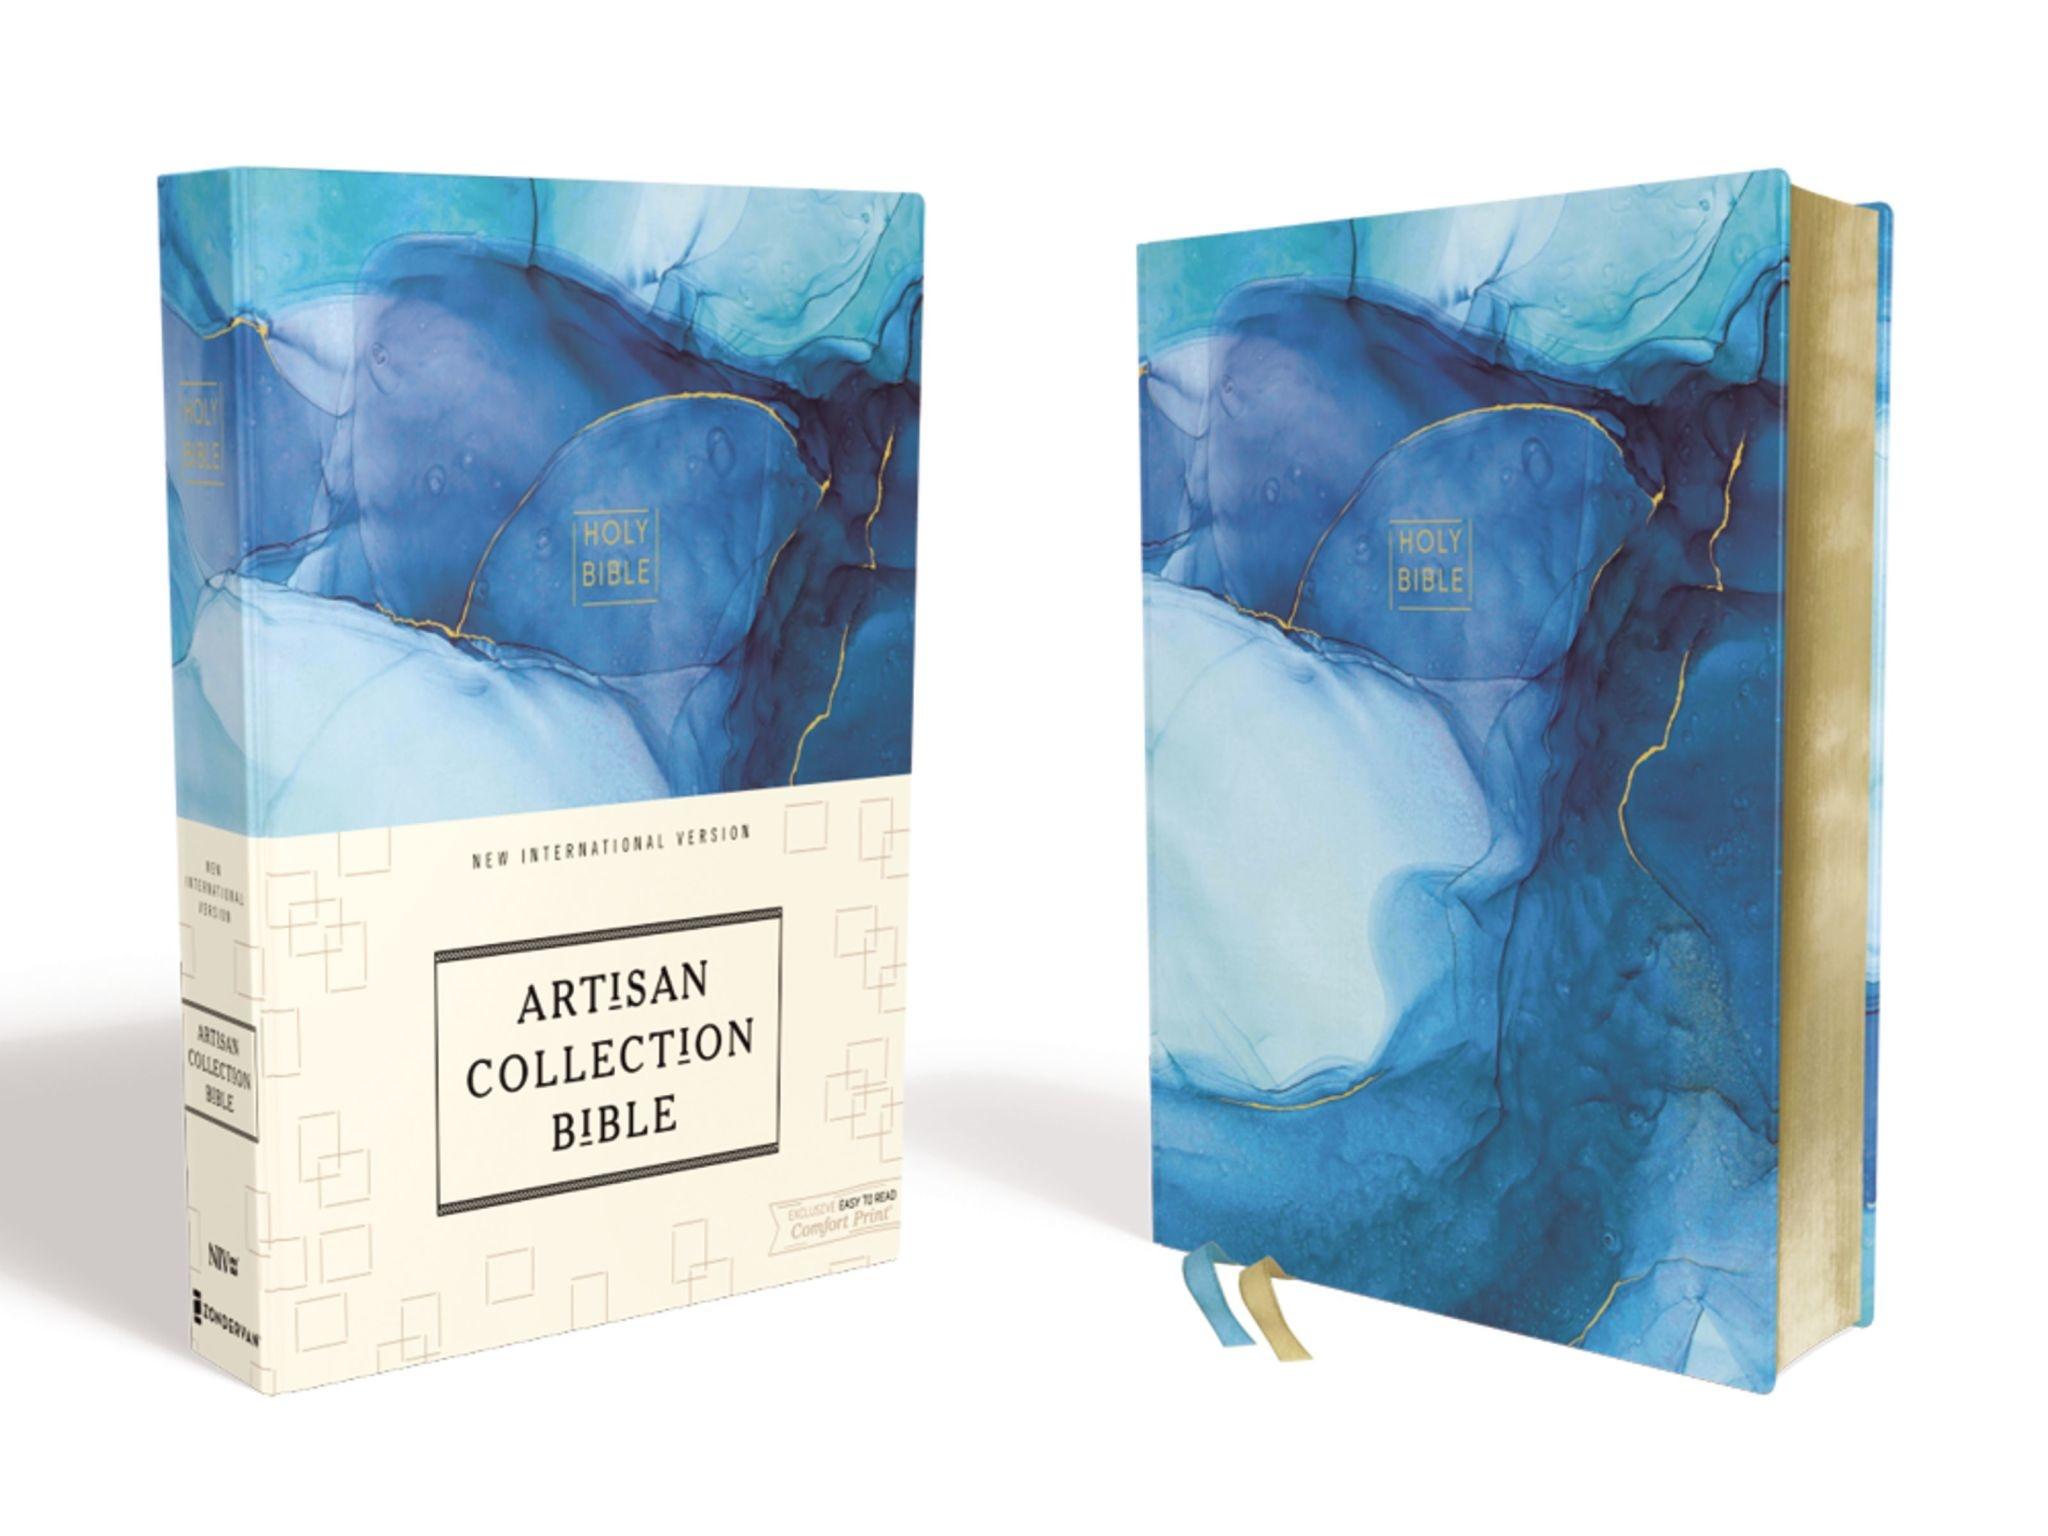 NIV Artisan Collection Bible - Blue